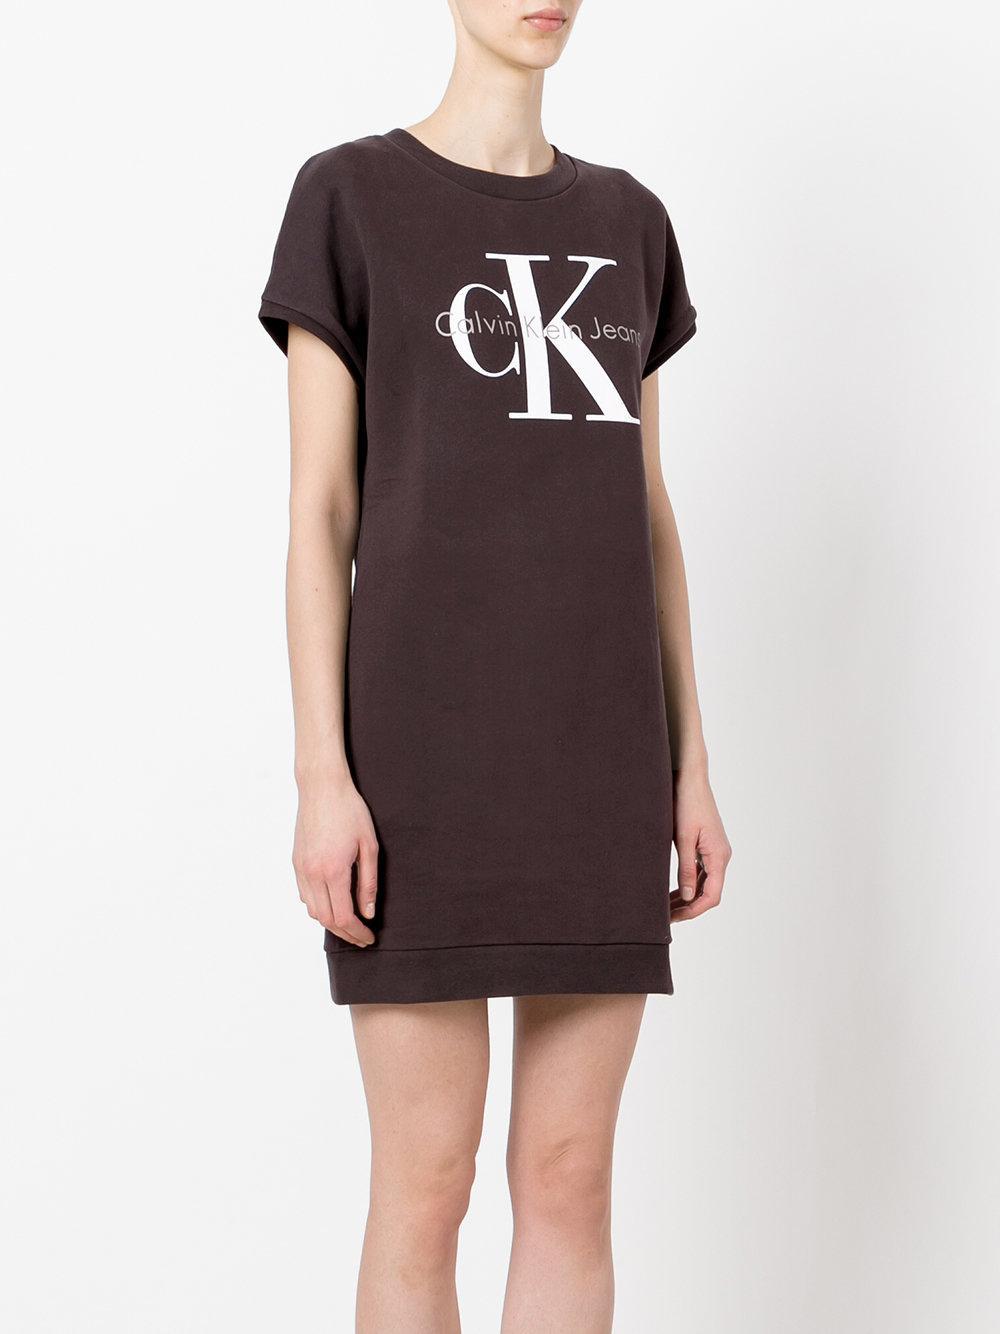 River Island Printed Shirt Dress